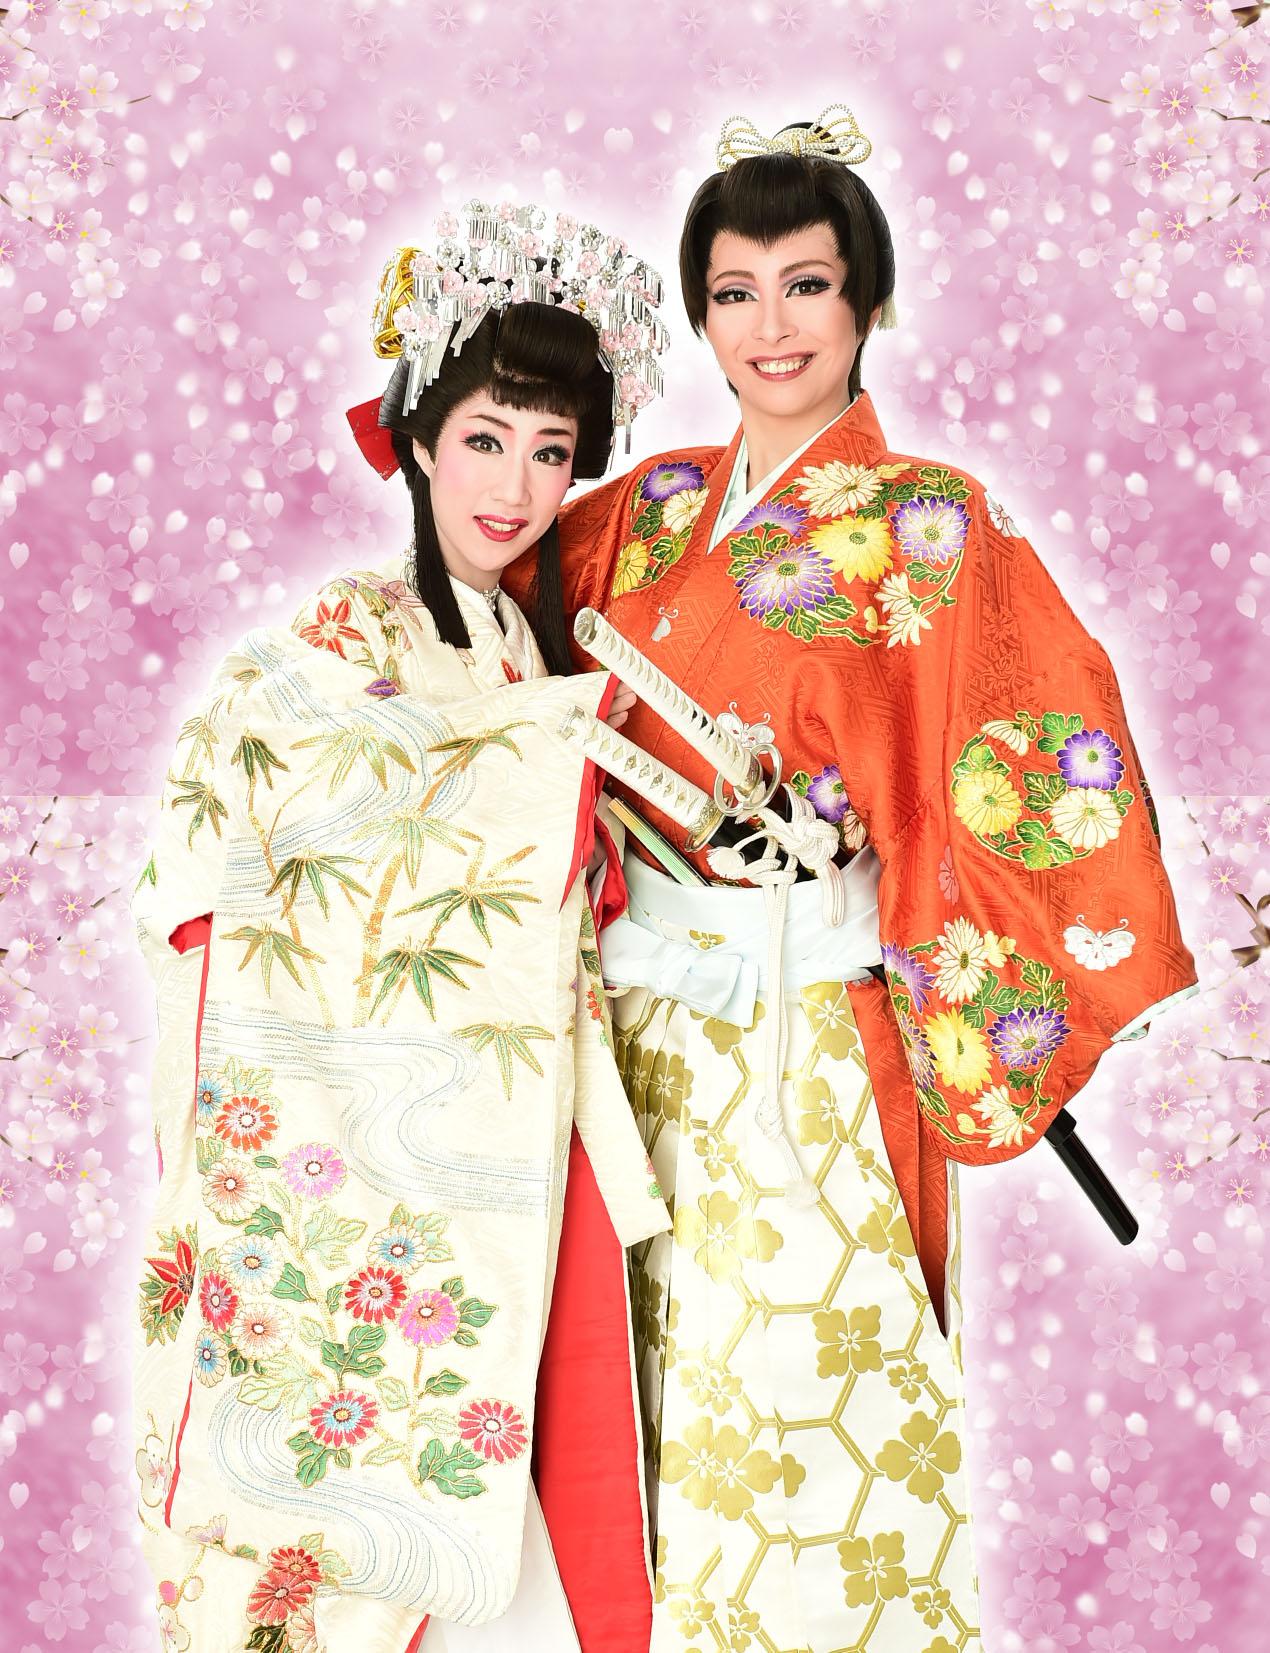 OSK日本歌劇団、若手中心の『狸御殿~HARU RANMAN~』4月に公演―91期初舞台生も出演